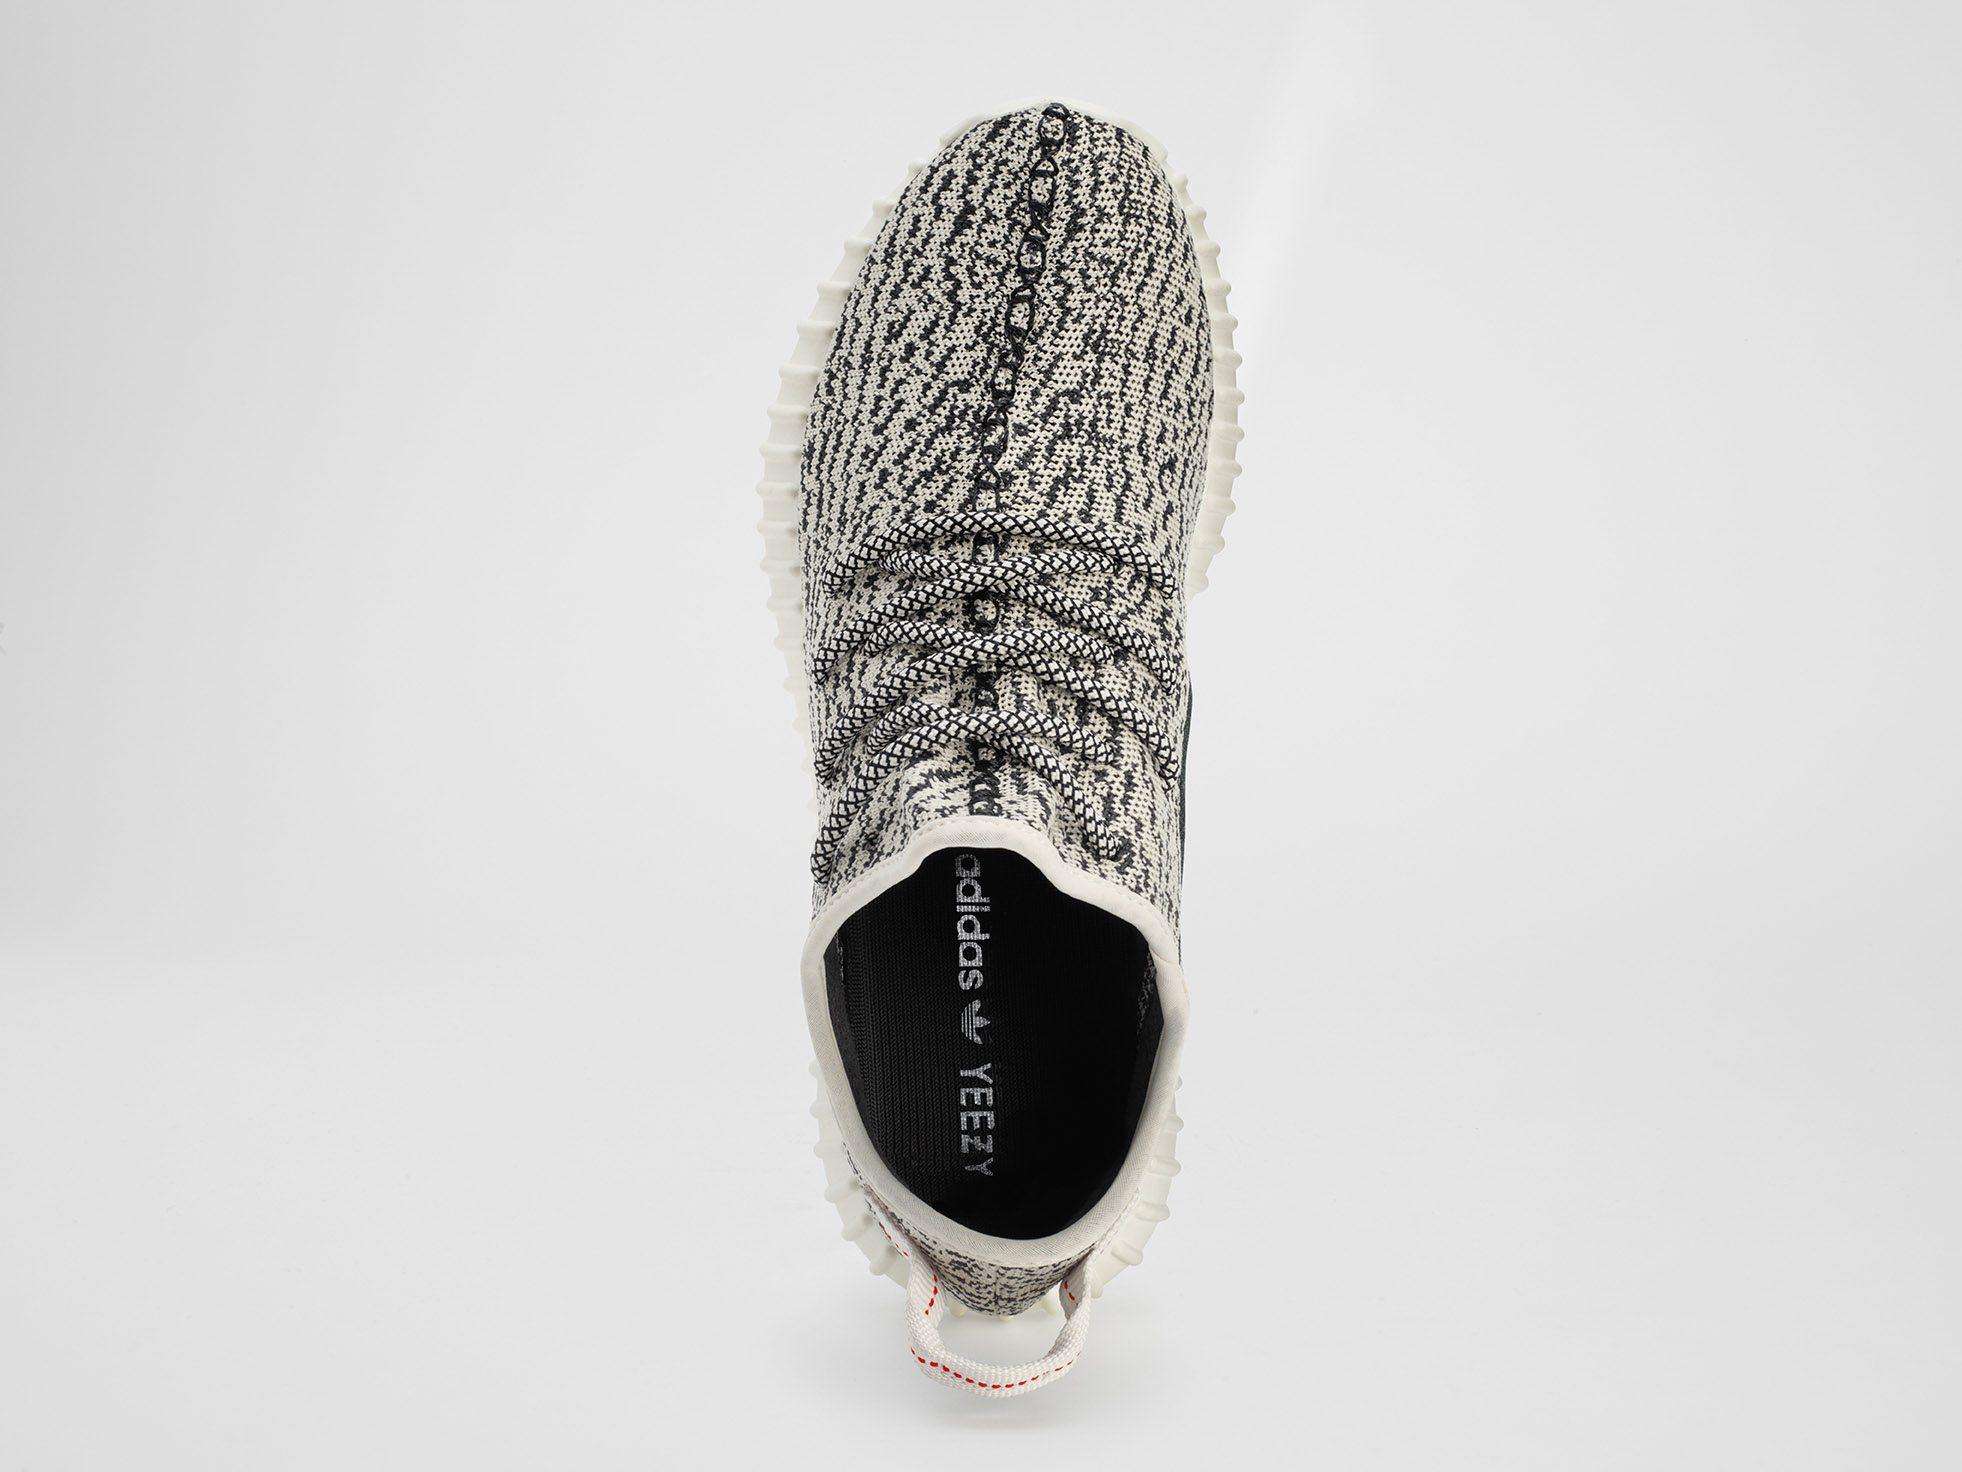 Kanye West x adidas Originals Yeezy Boost 350 6